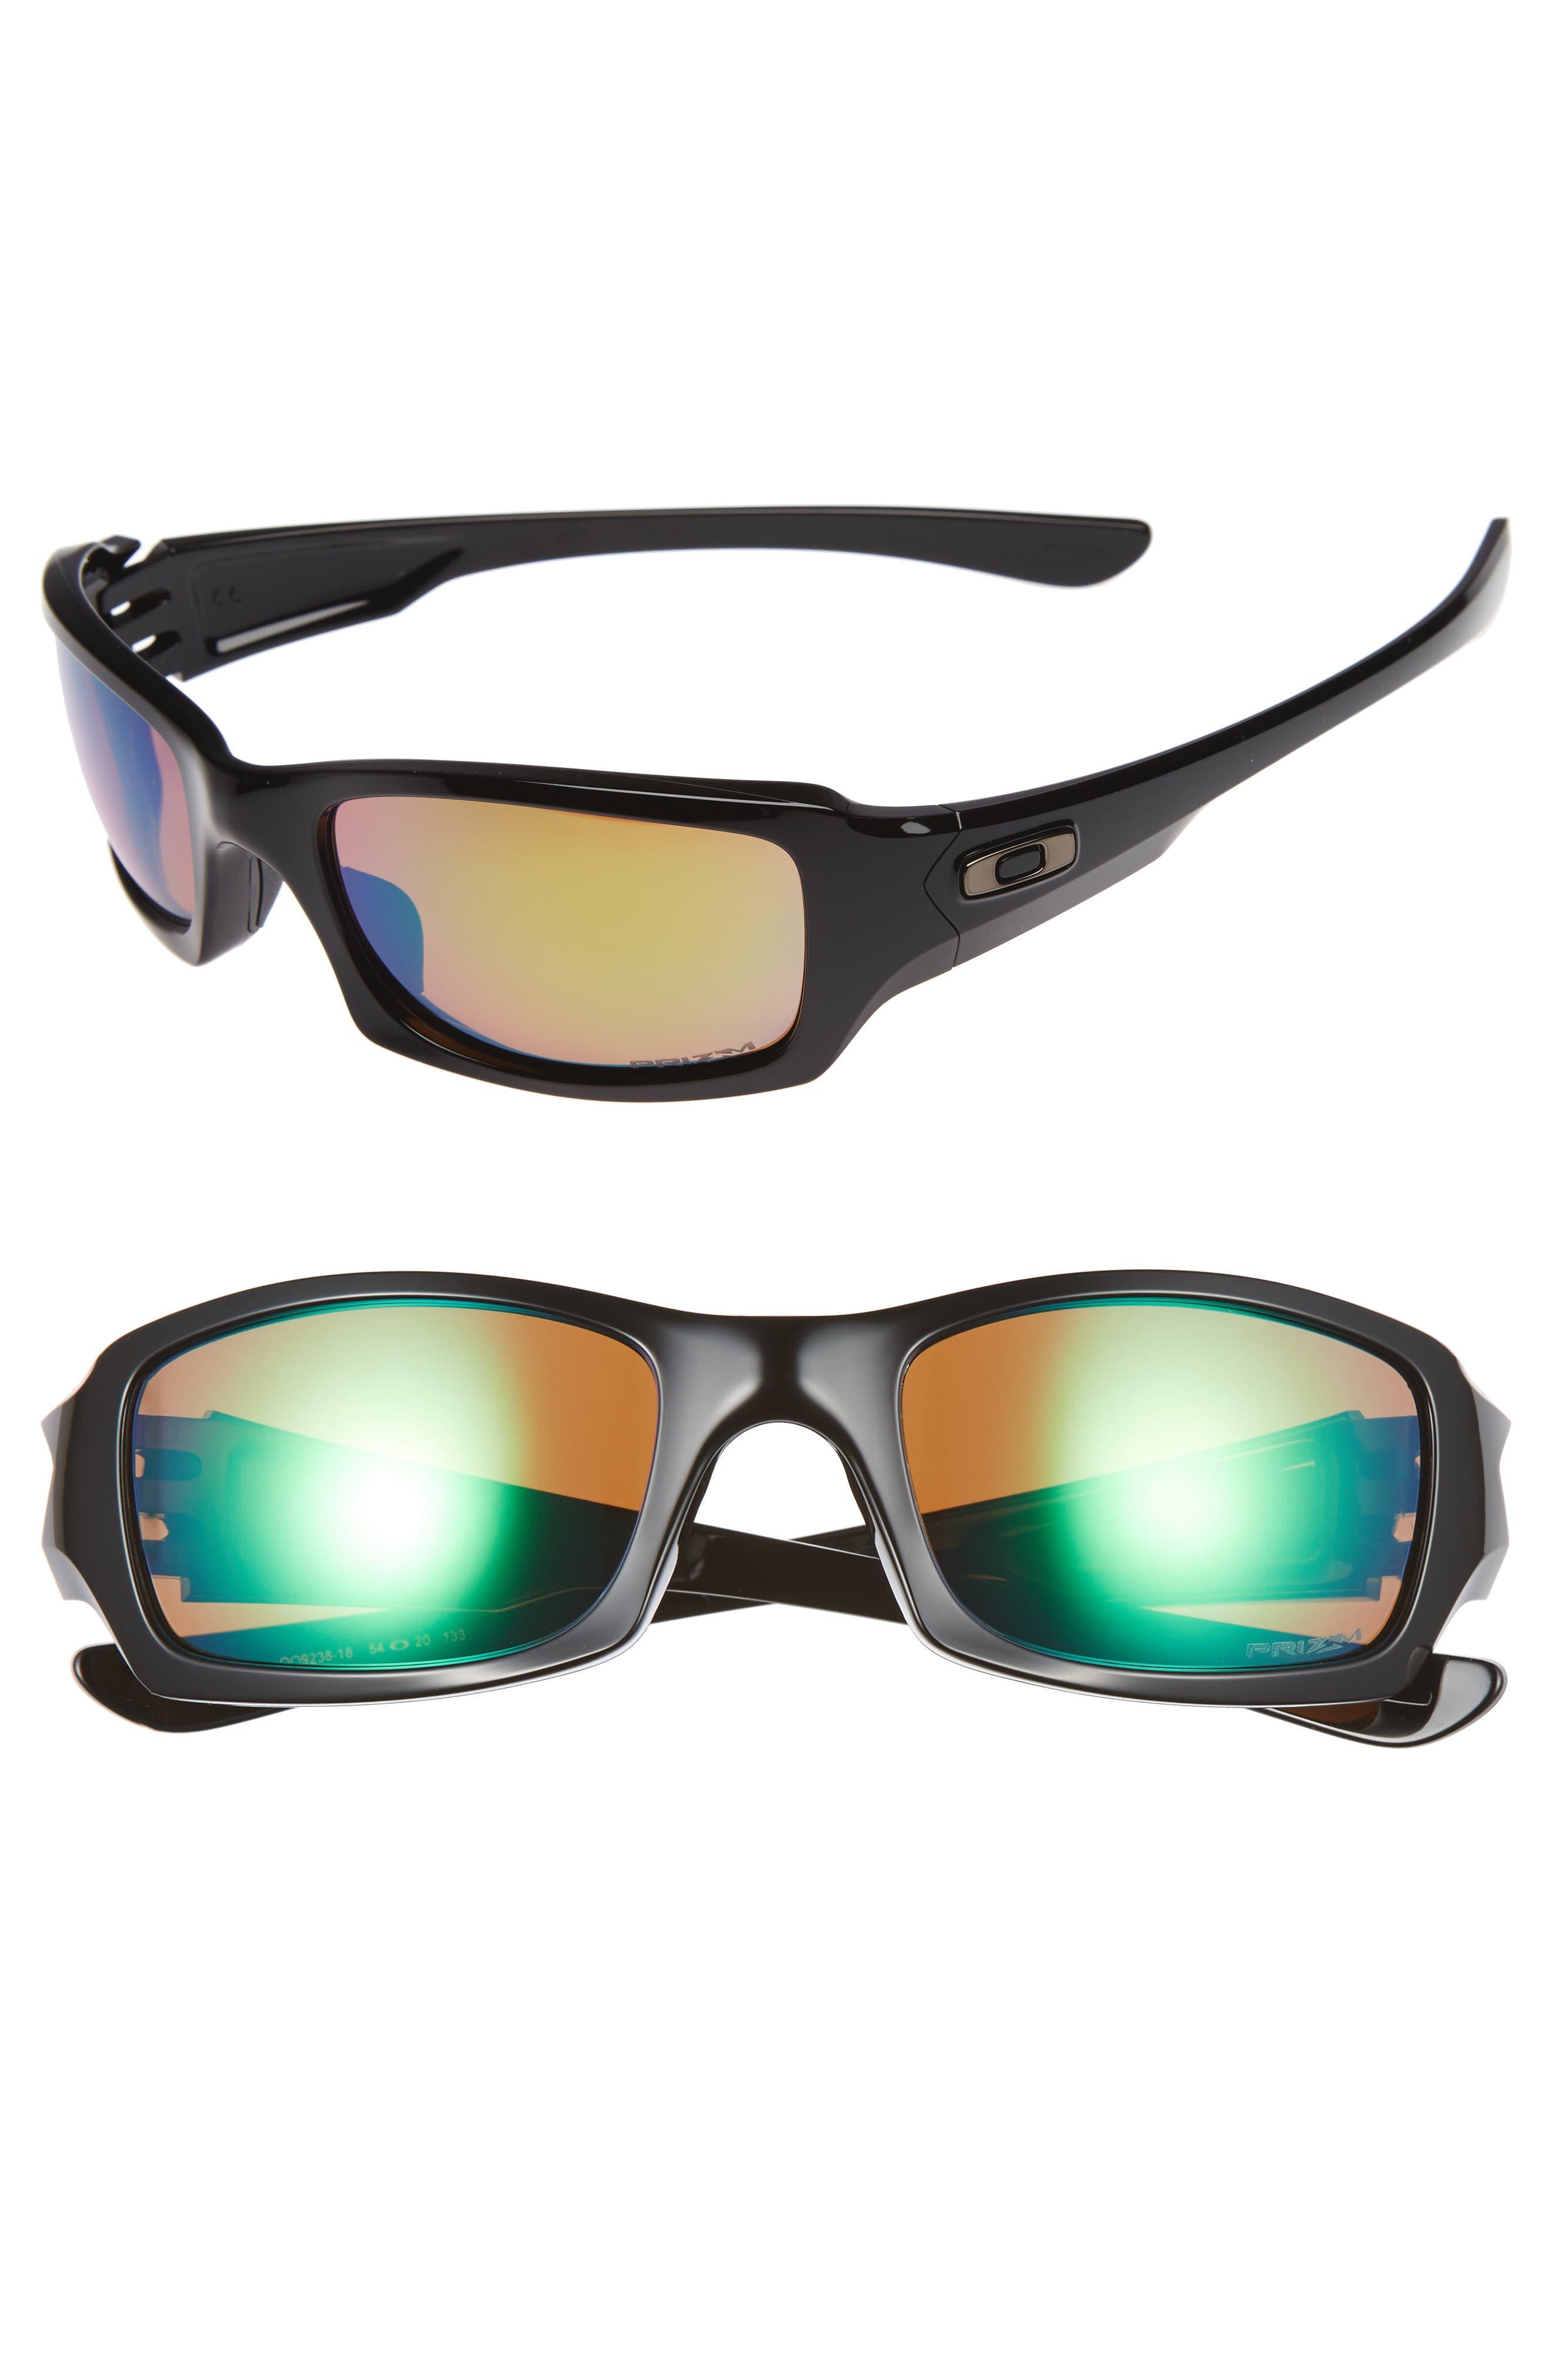 Fives Squared H2O 54mm Polarized Sunglasses,                         Main,                         color, BLACK